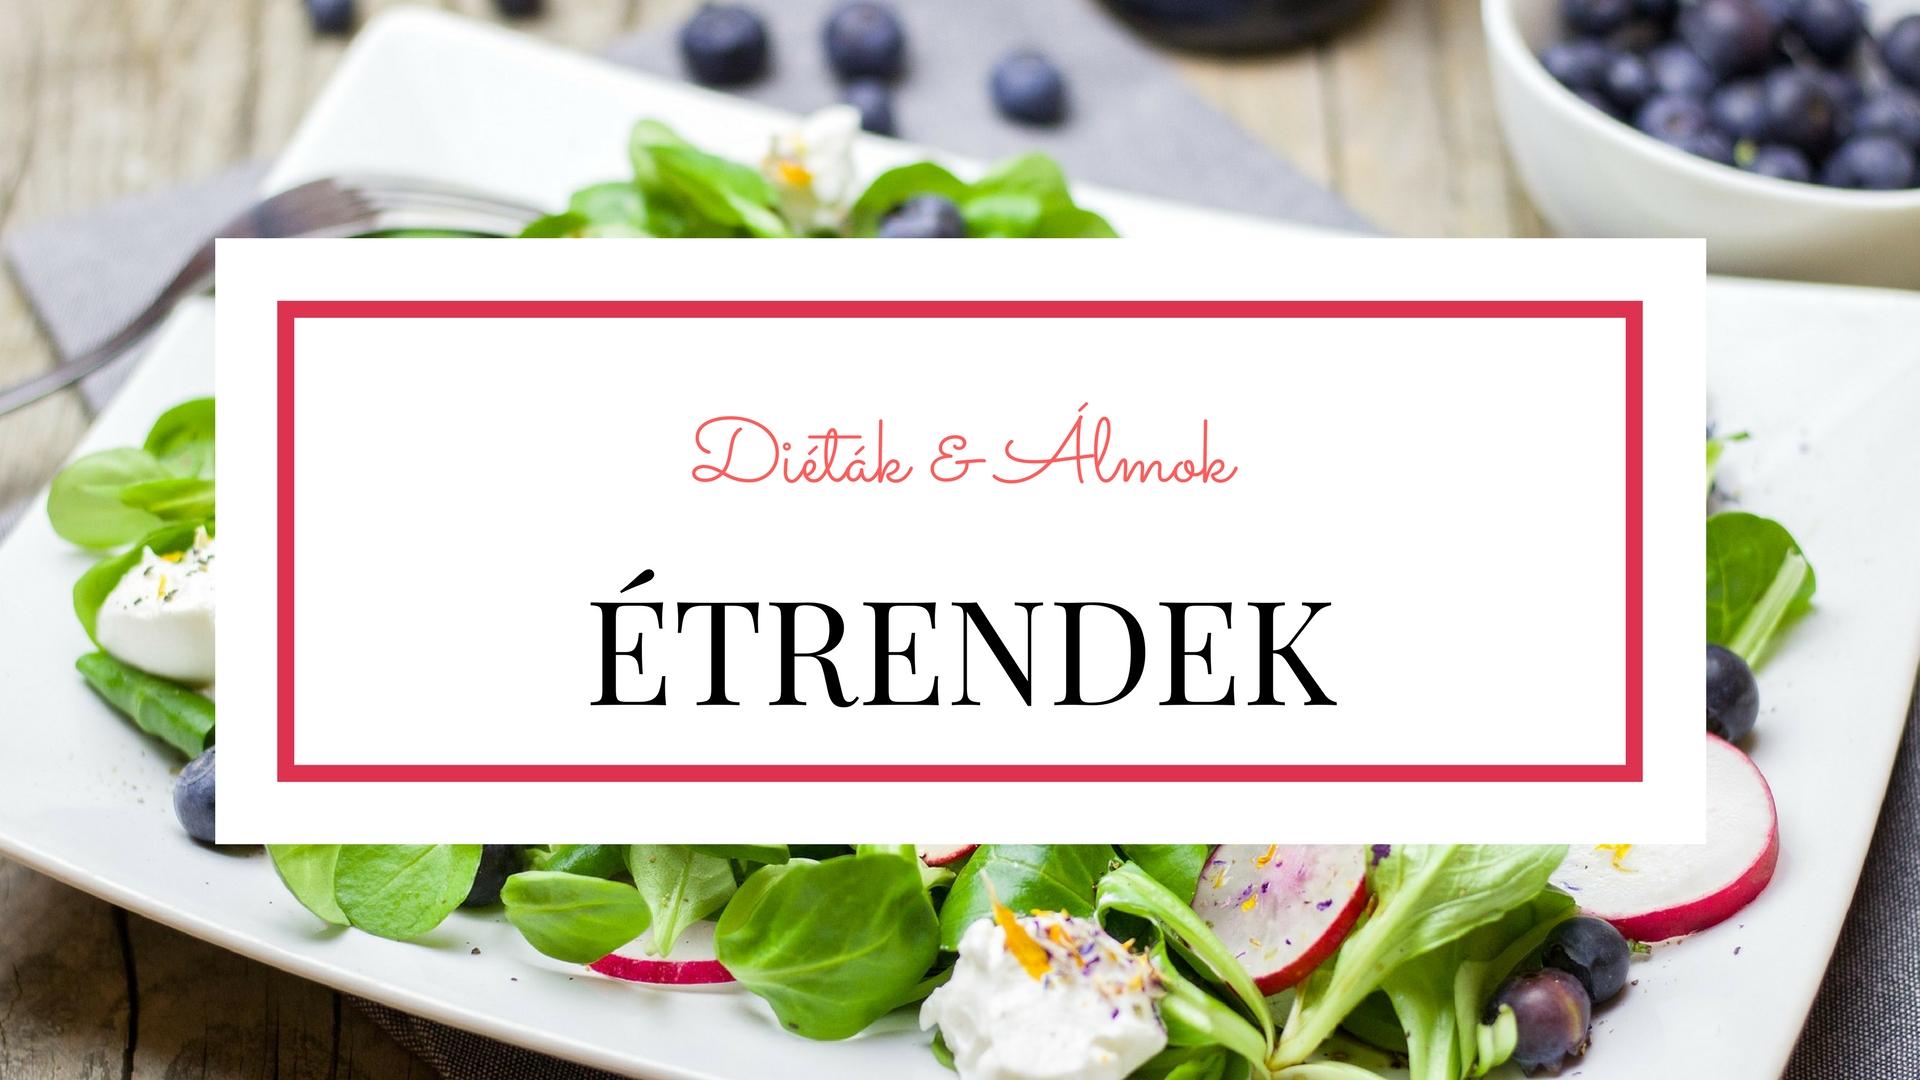 dietak_almok_etrendek.jpg